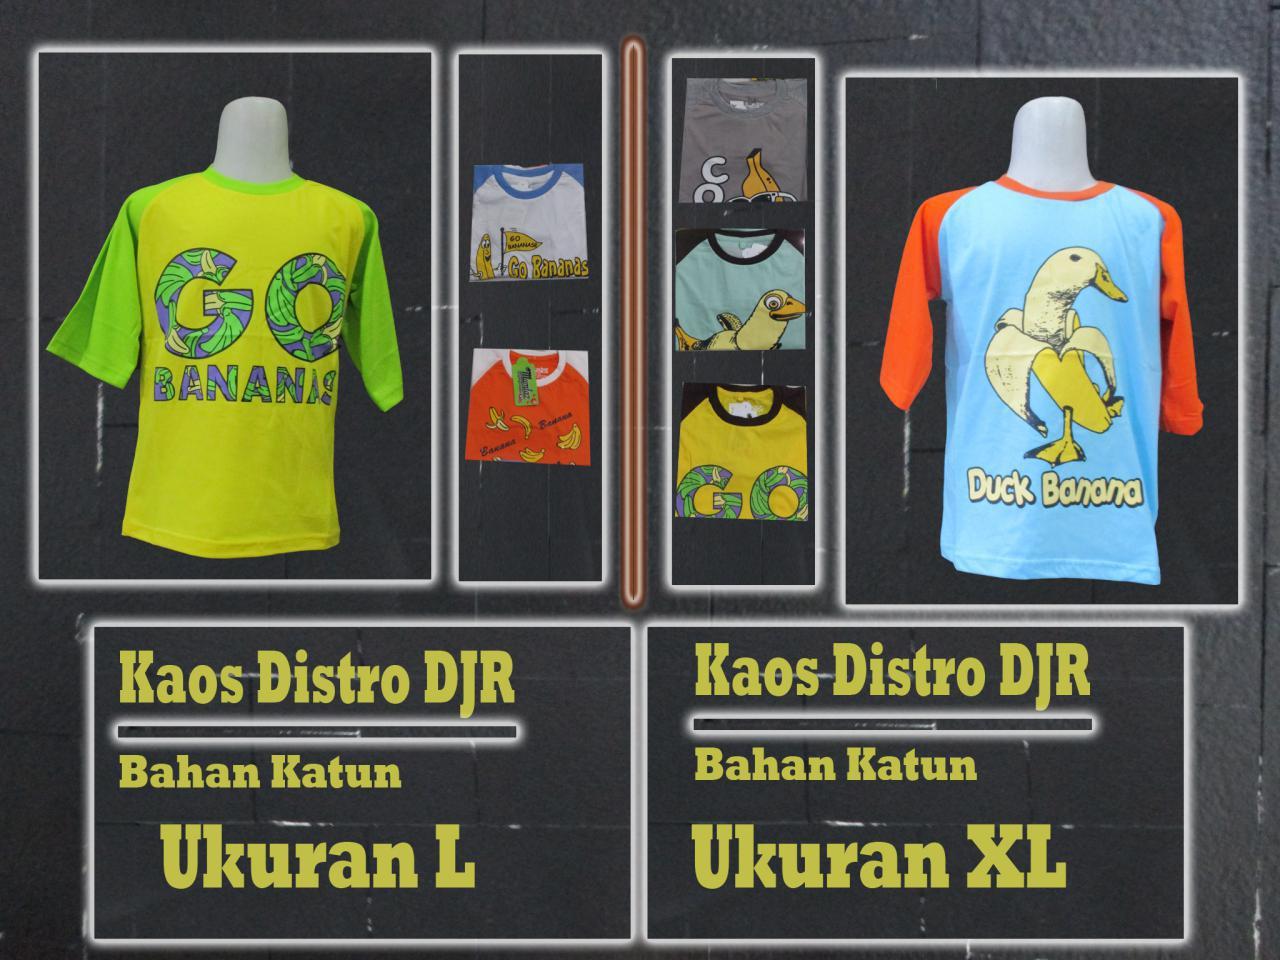 Pusat Grosir Baju Murah Solo Klewer 2019 Kulakan Kaos Distro Anak Murah 14ribuan